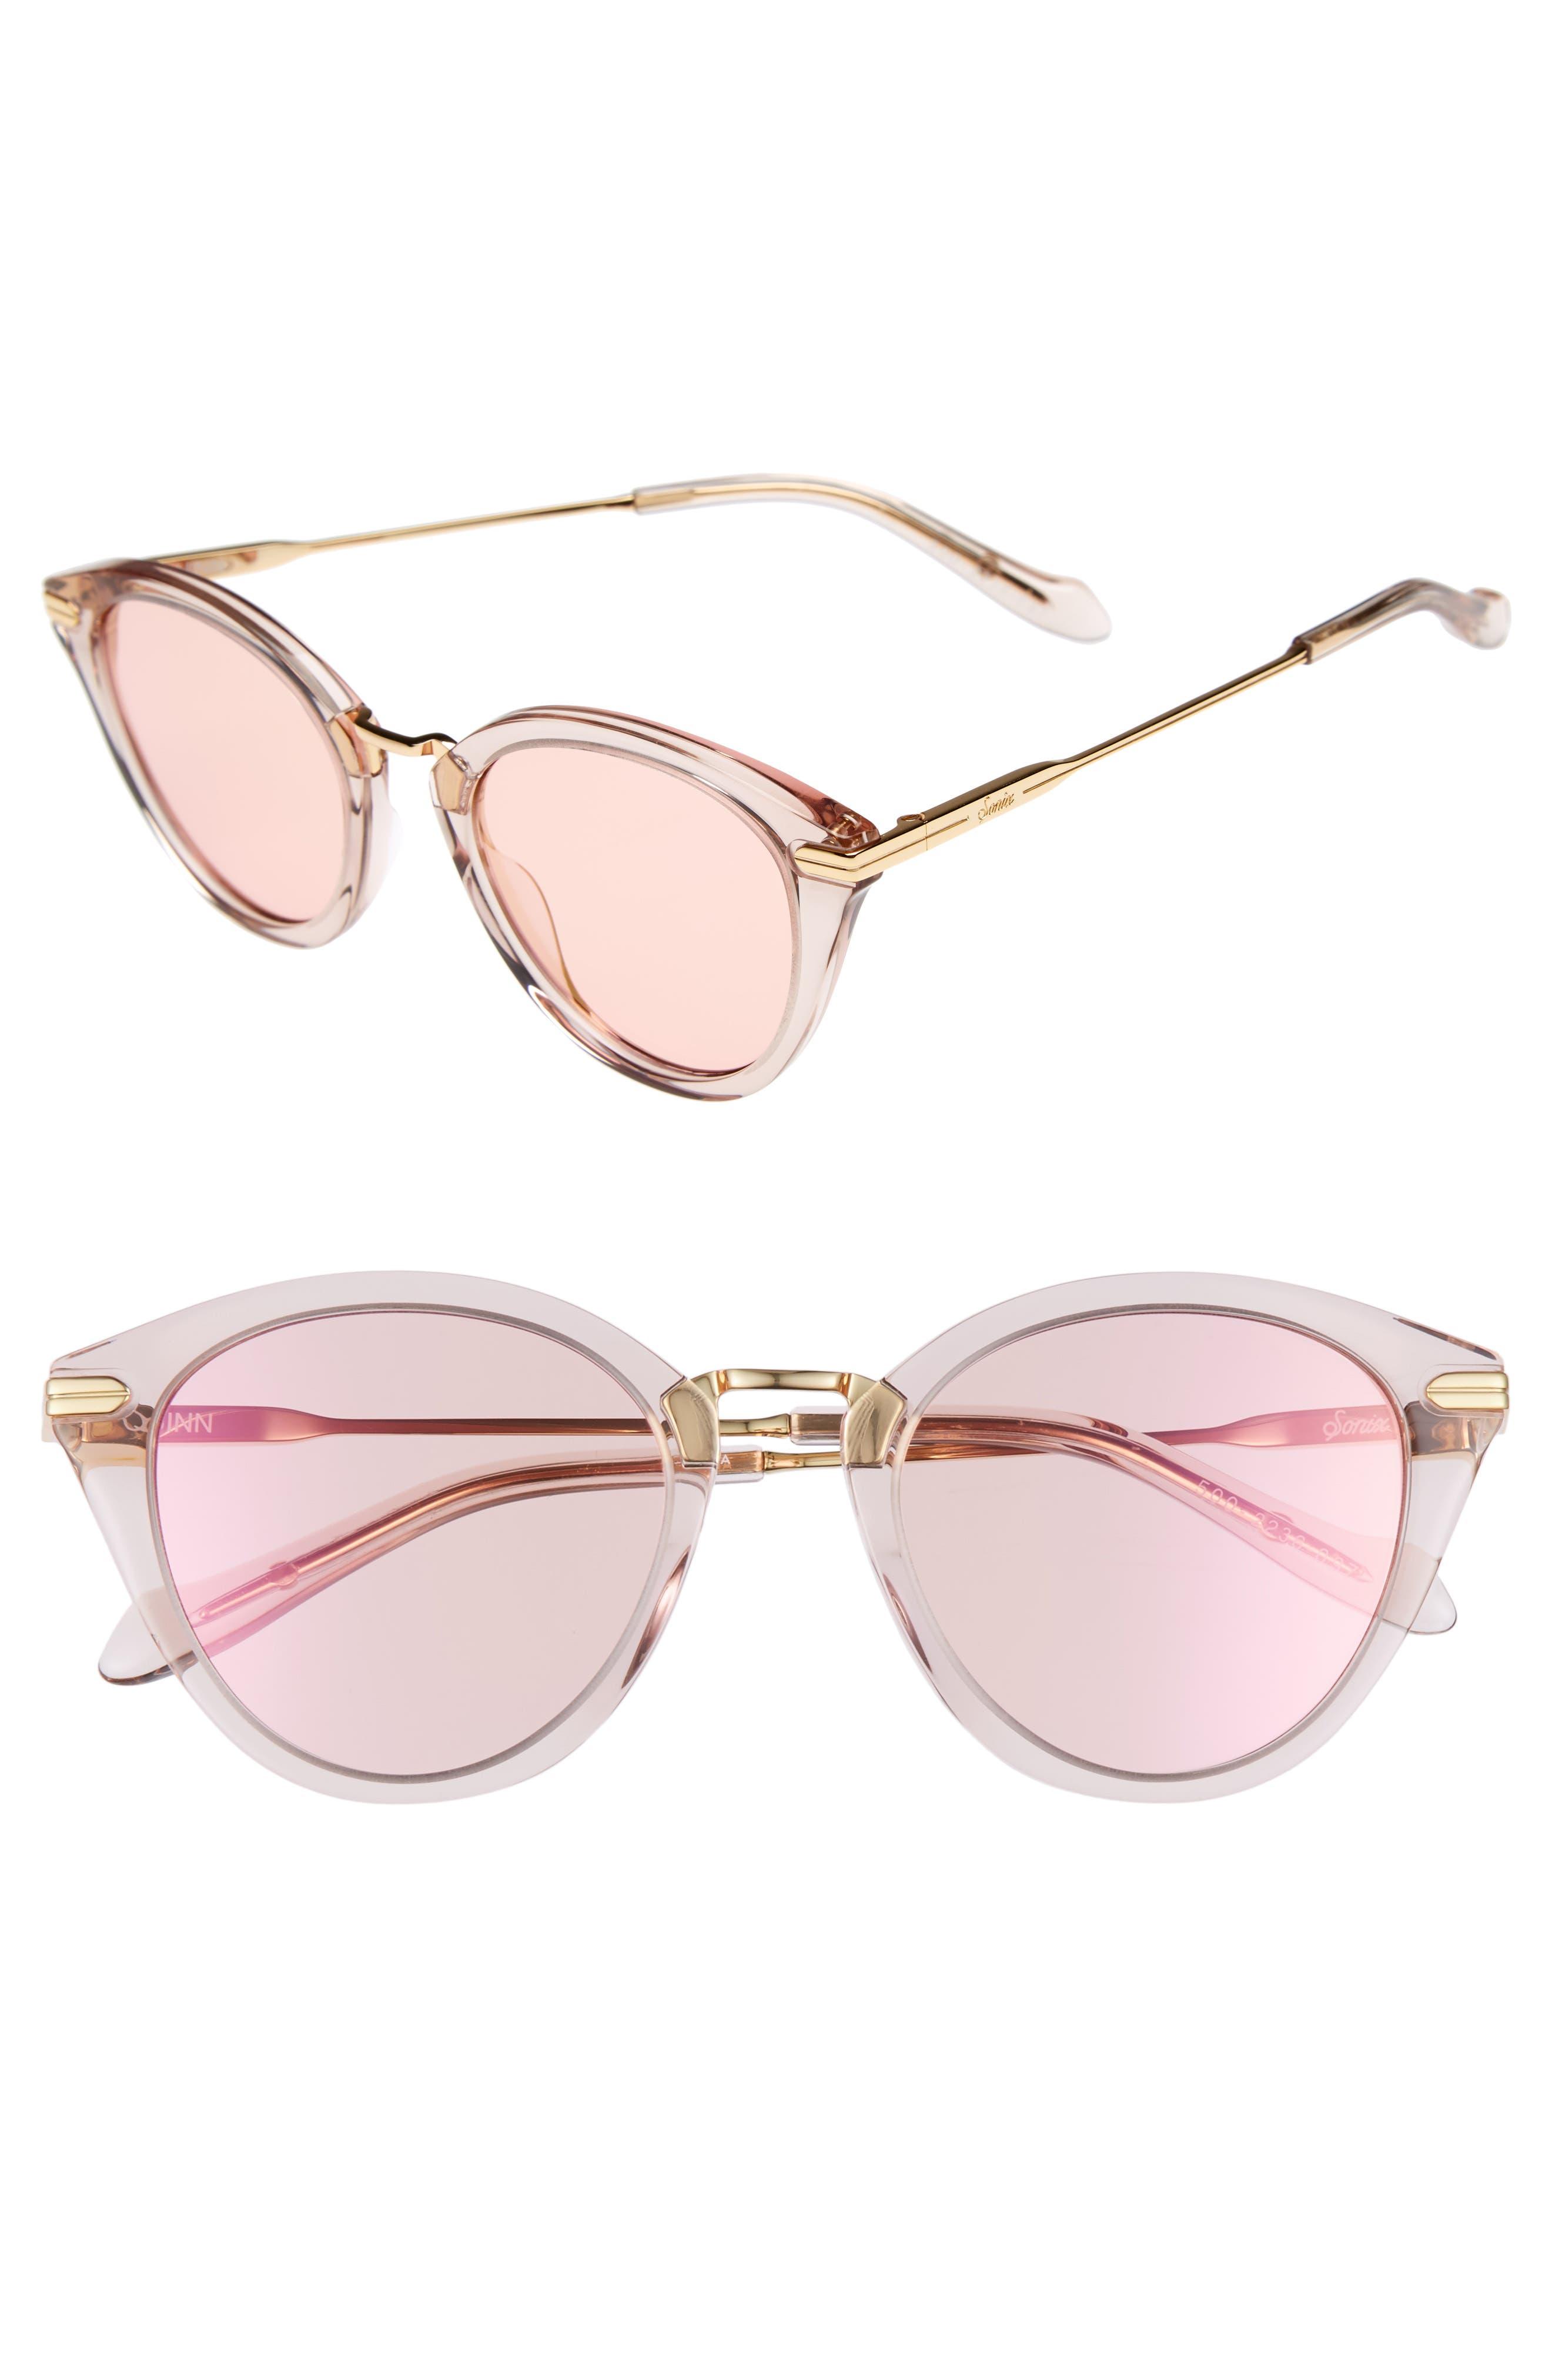 Main Image - Sonix Quinn 48mm Cat Eye Sunglasses